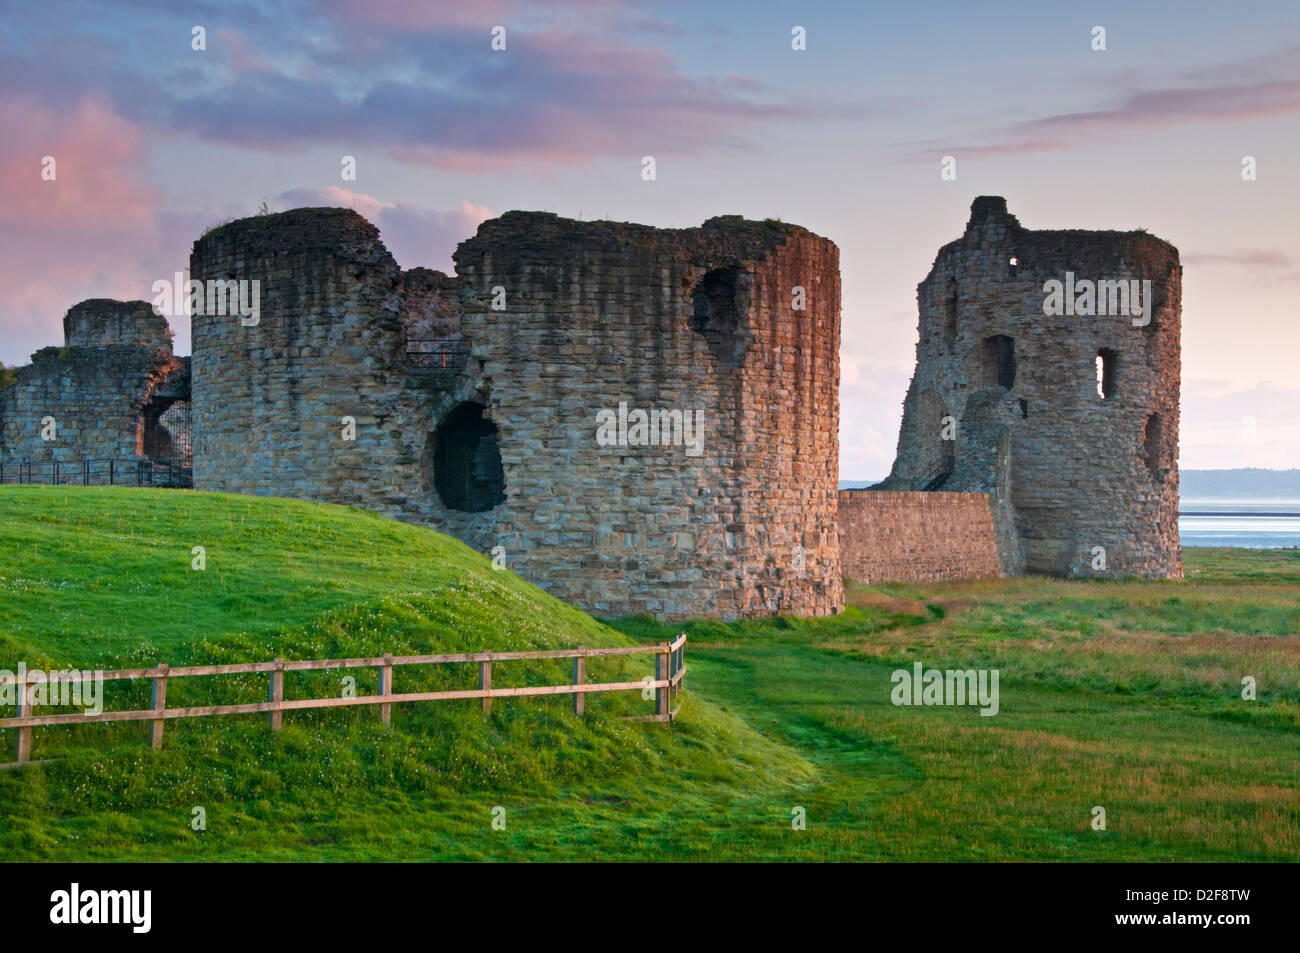 Dawn at Flint Castle, Flint, Flintshire, North Wales, UK - Stock Image